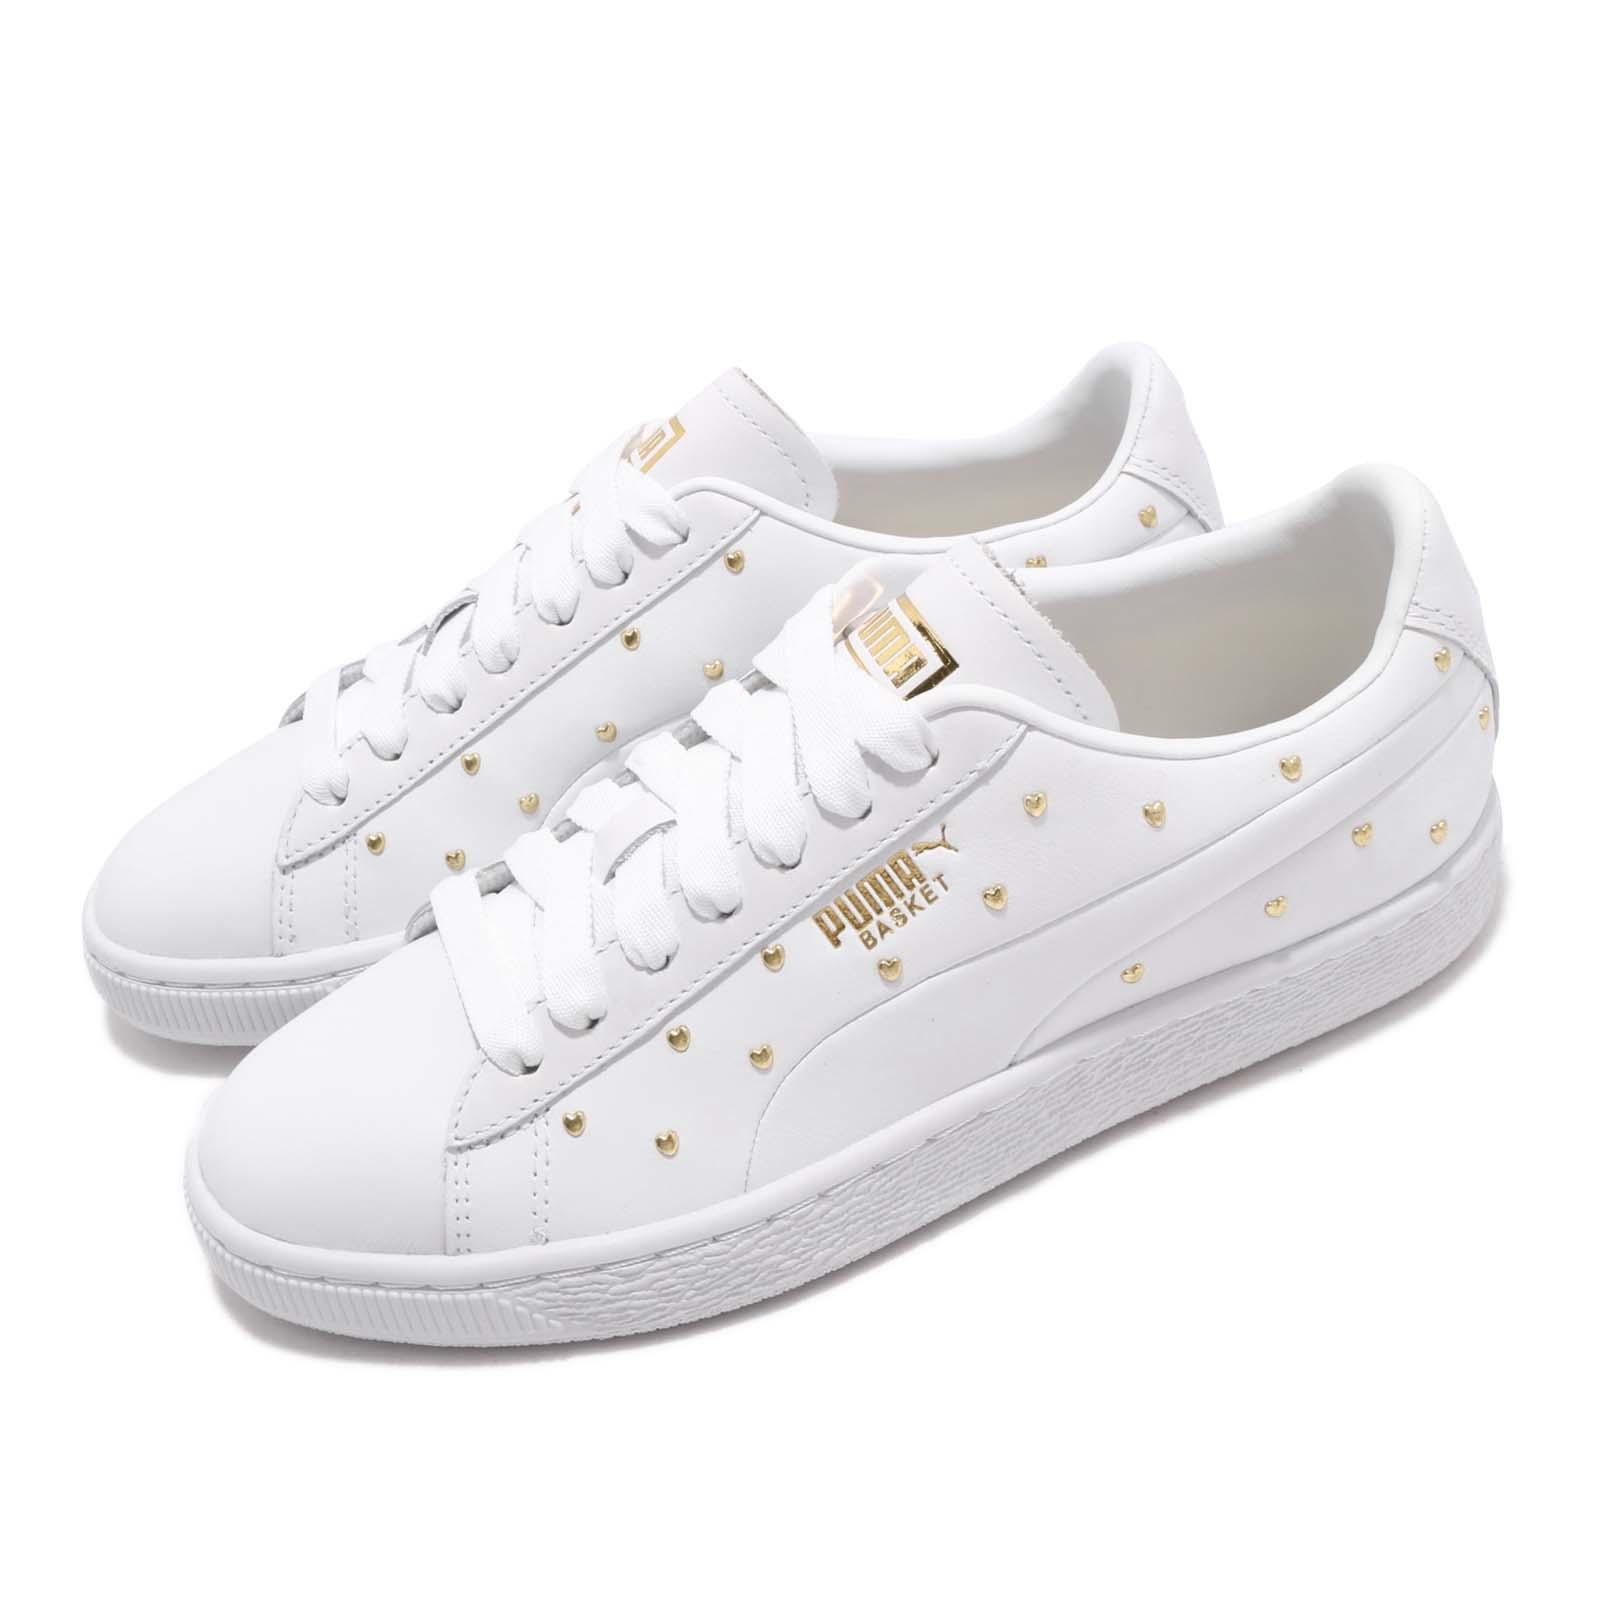 Puma 休閒鞋 Basket Studs 運動 女鞋 36929801